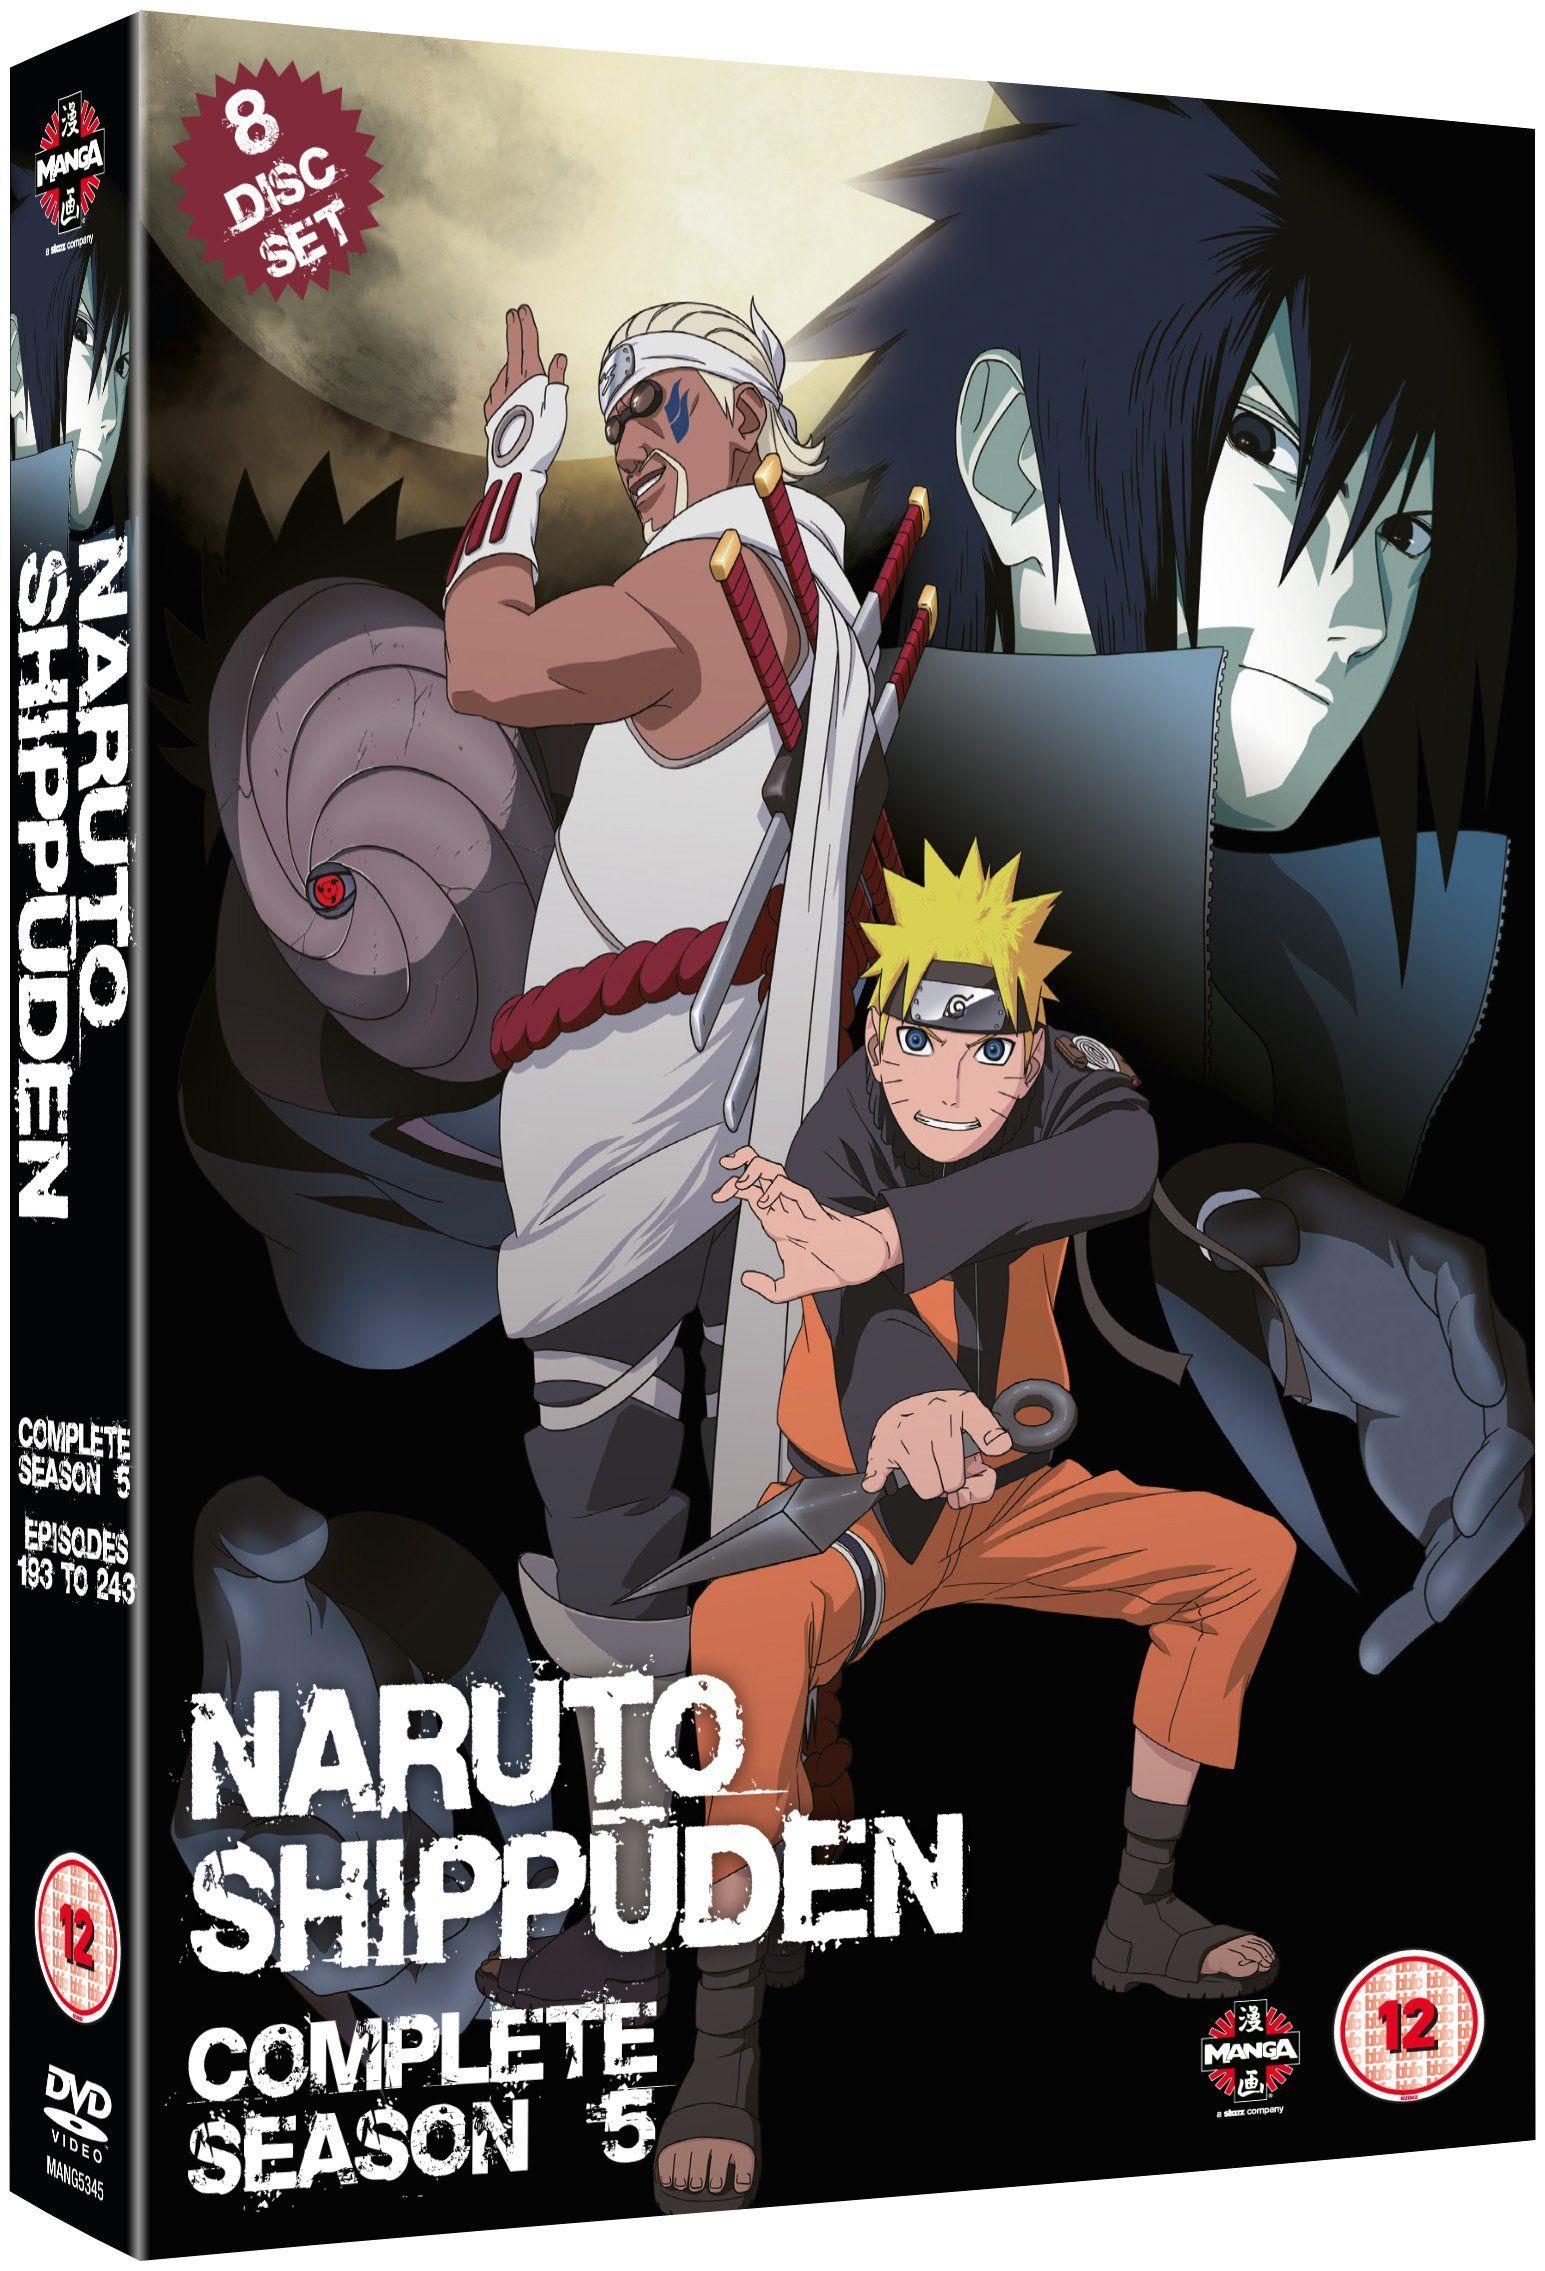 Naruto shippuden complete series 5 box set episodes 193